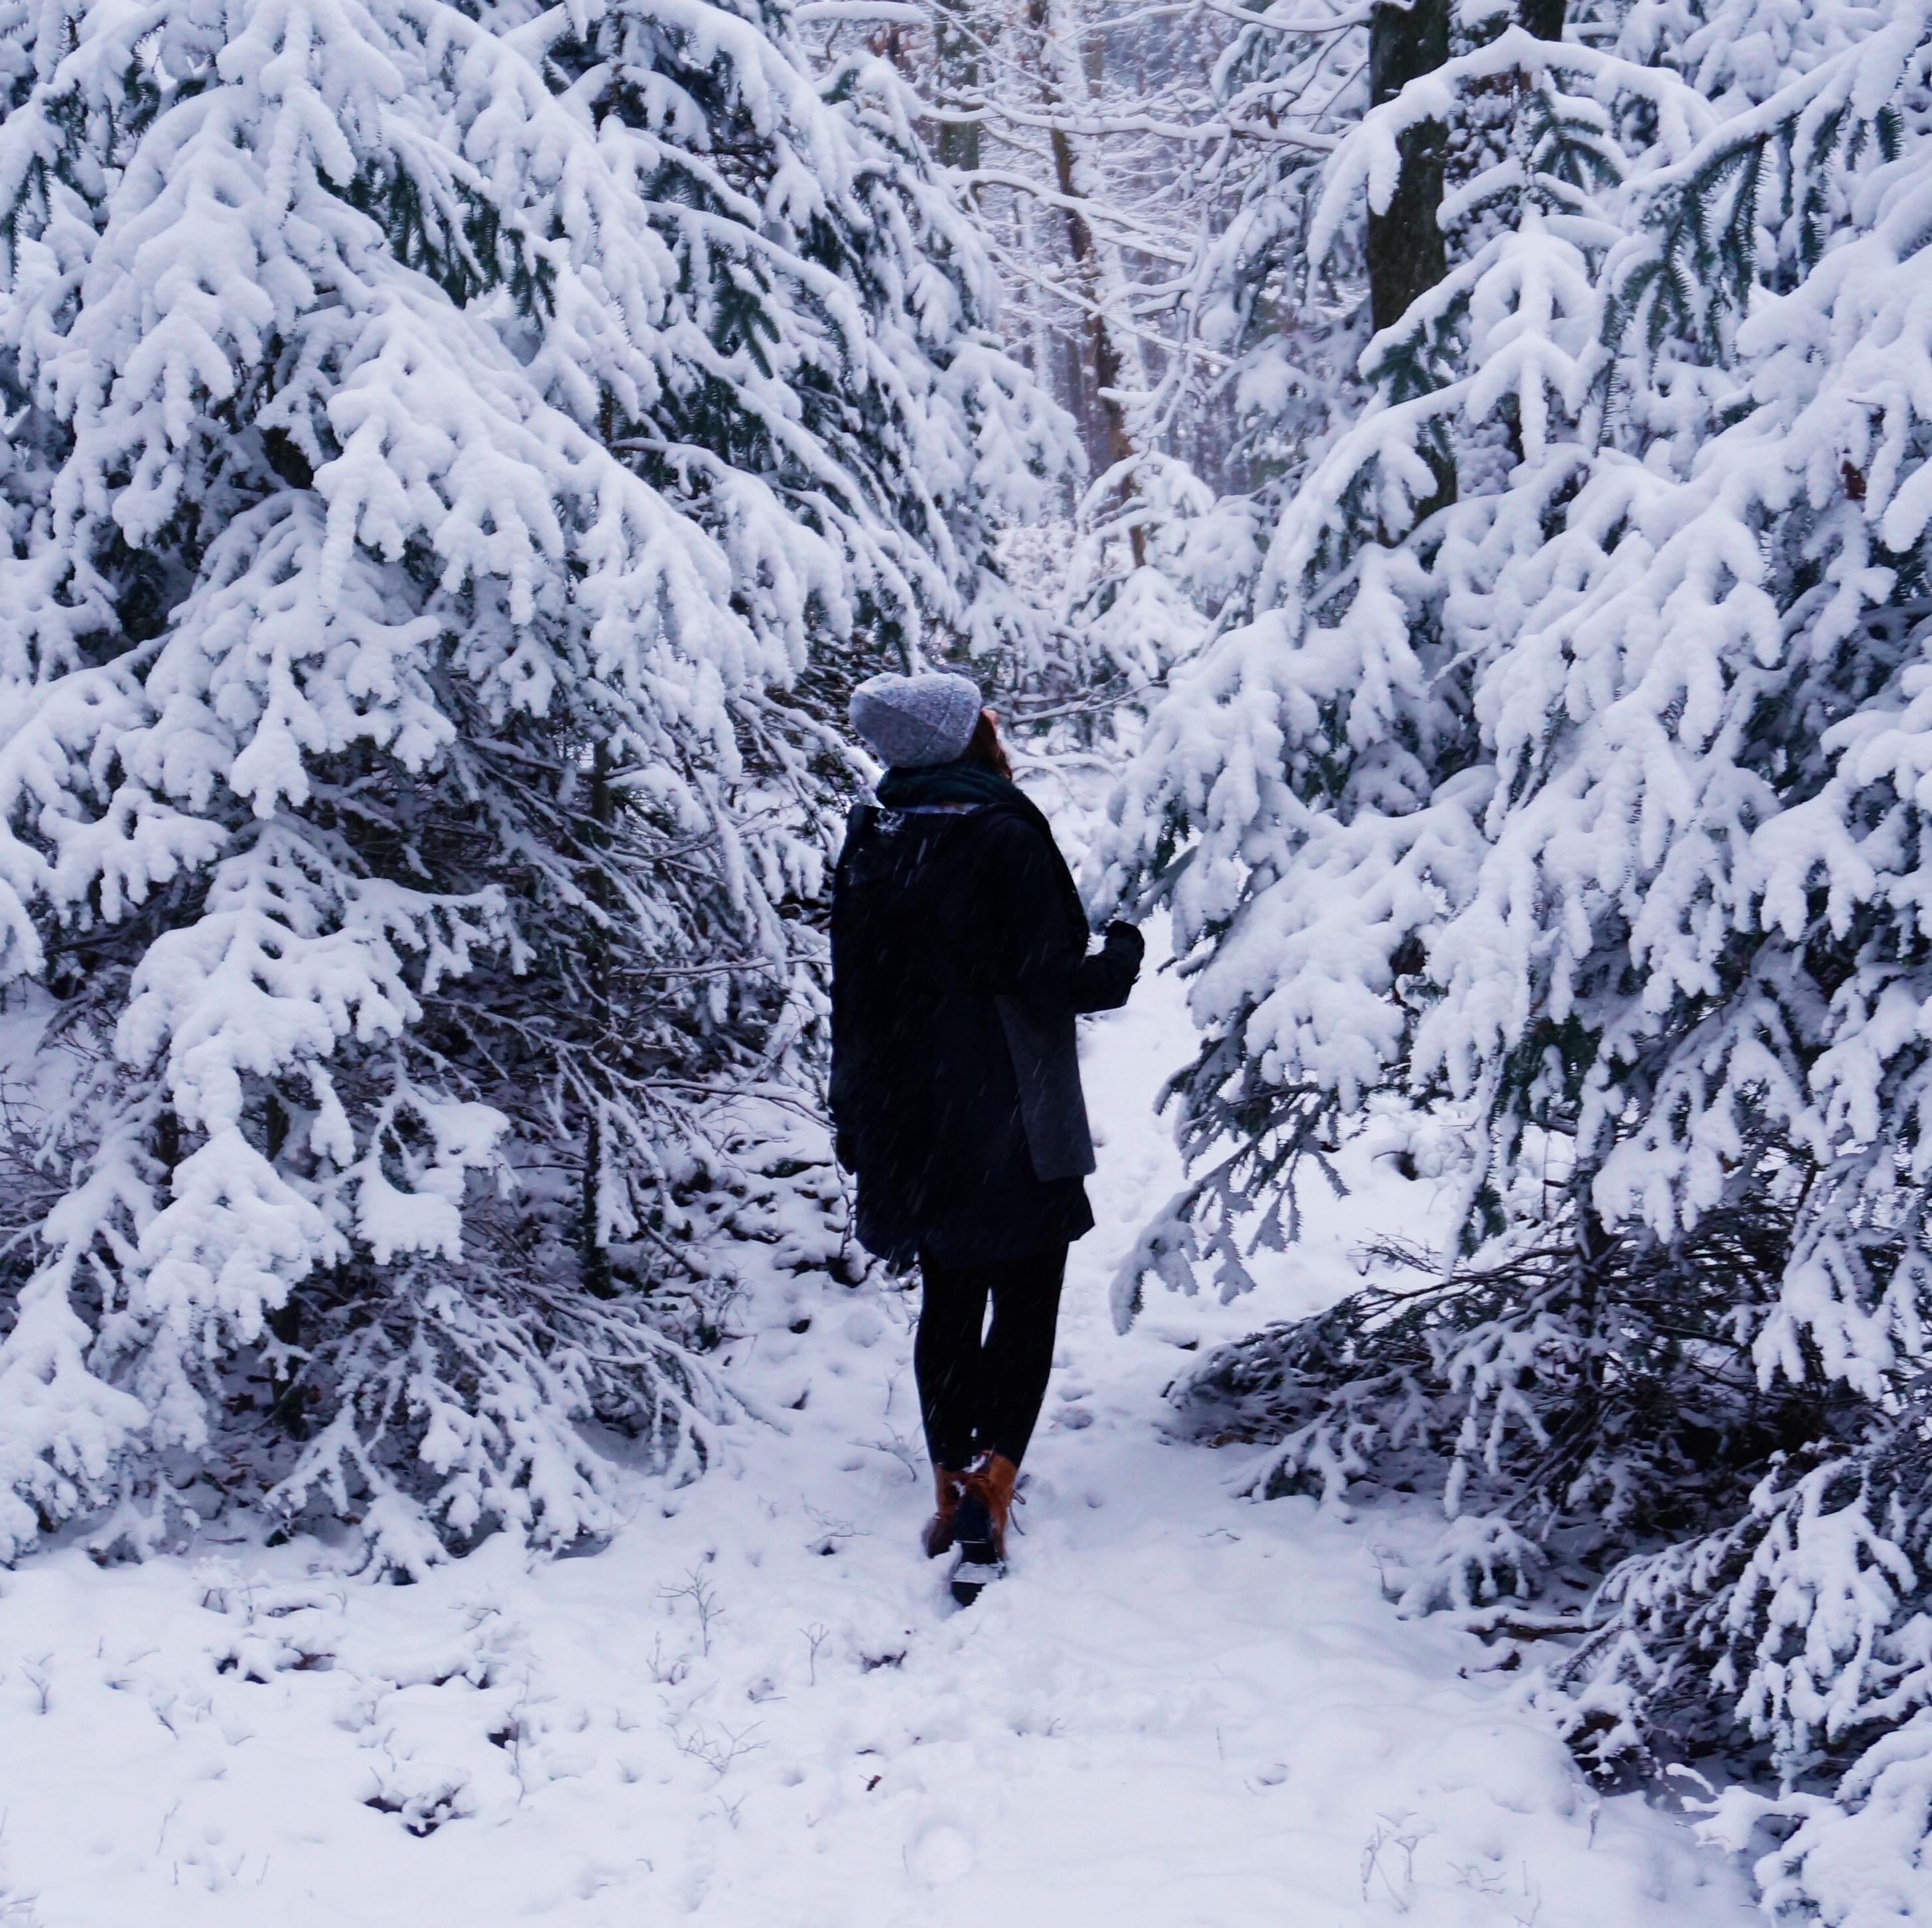 Roadtrip Geschenk Reise Geschenkidee Kurztrip Camping Wohnwagen , Kurztrip Dublin Europa, Schnee Wandern Berge Geschenk